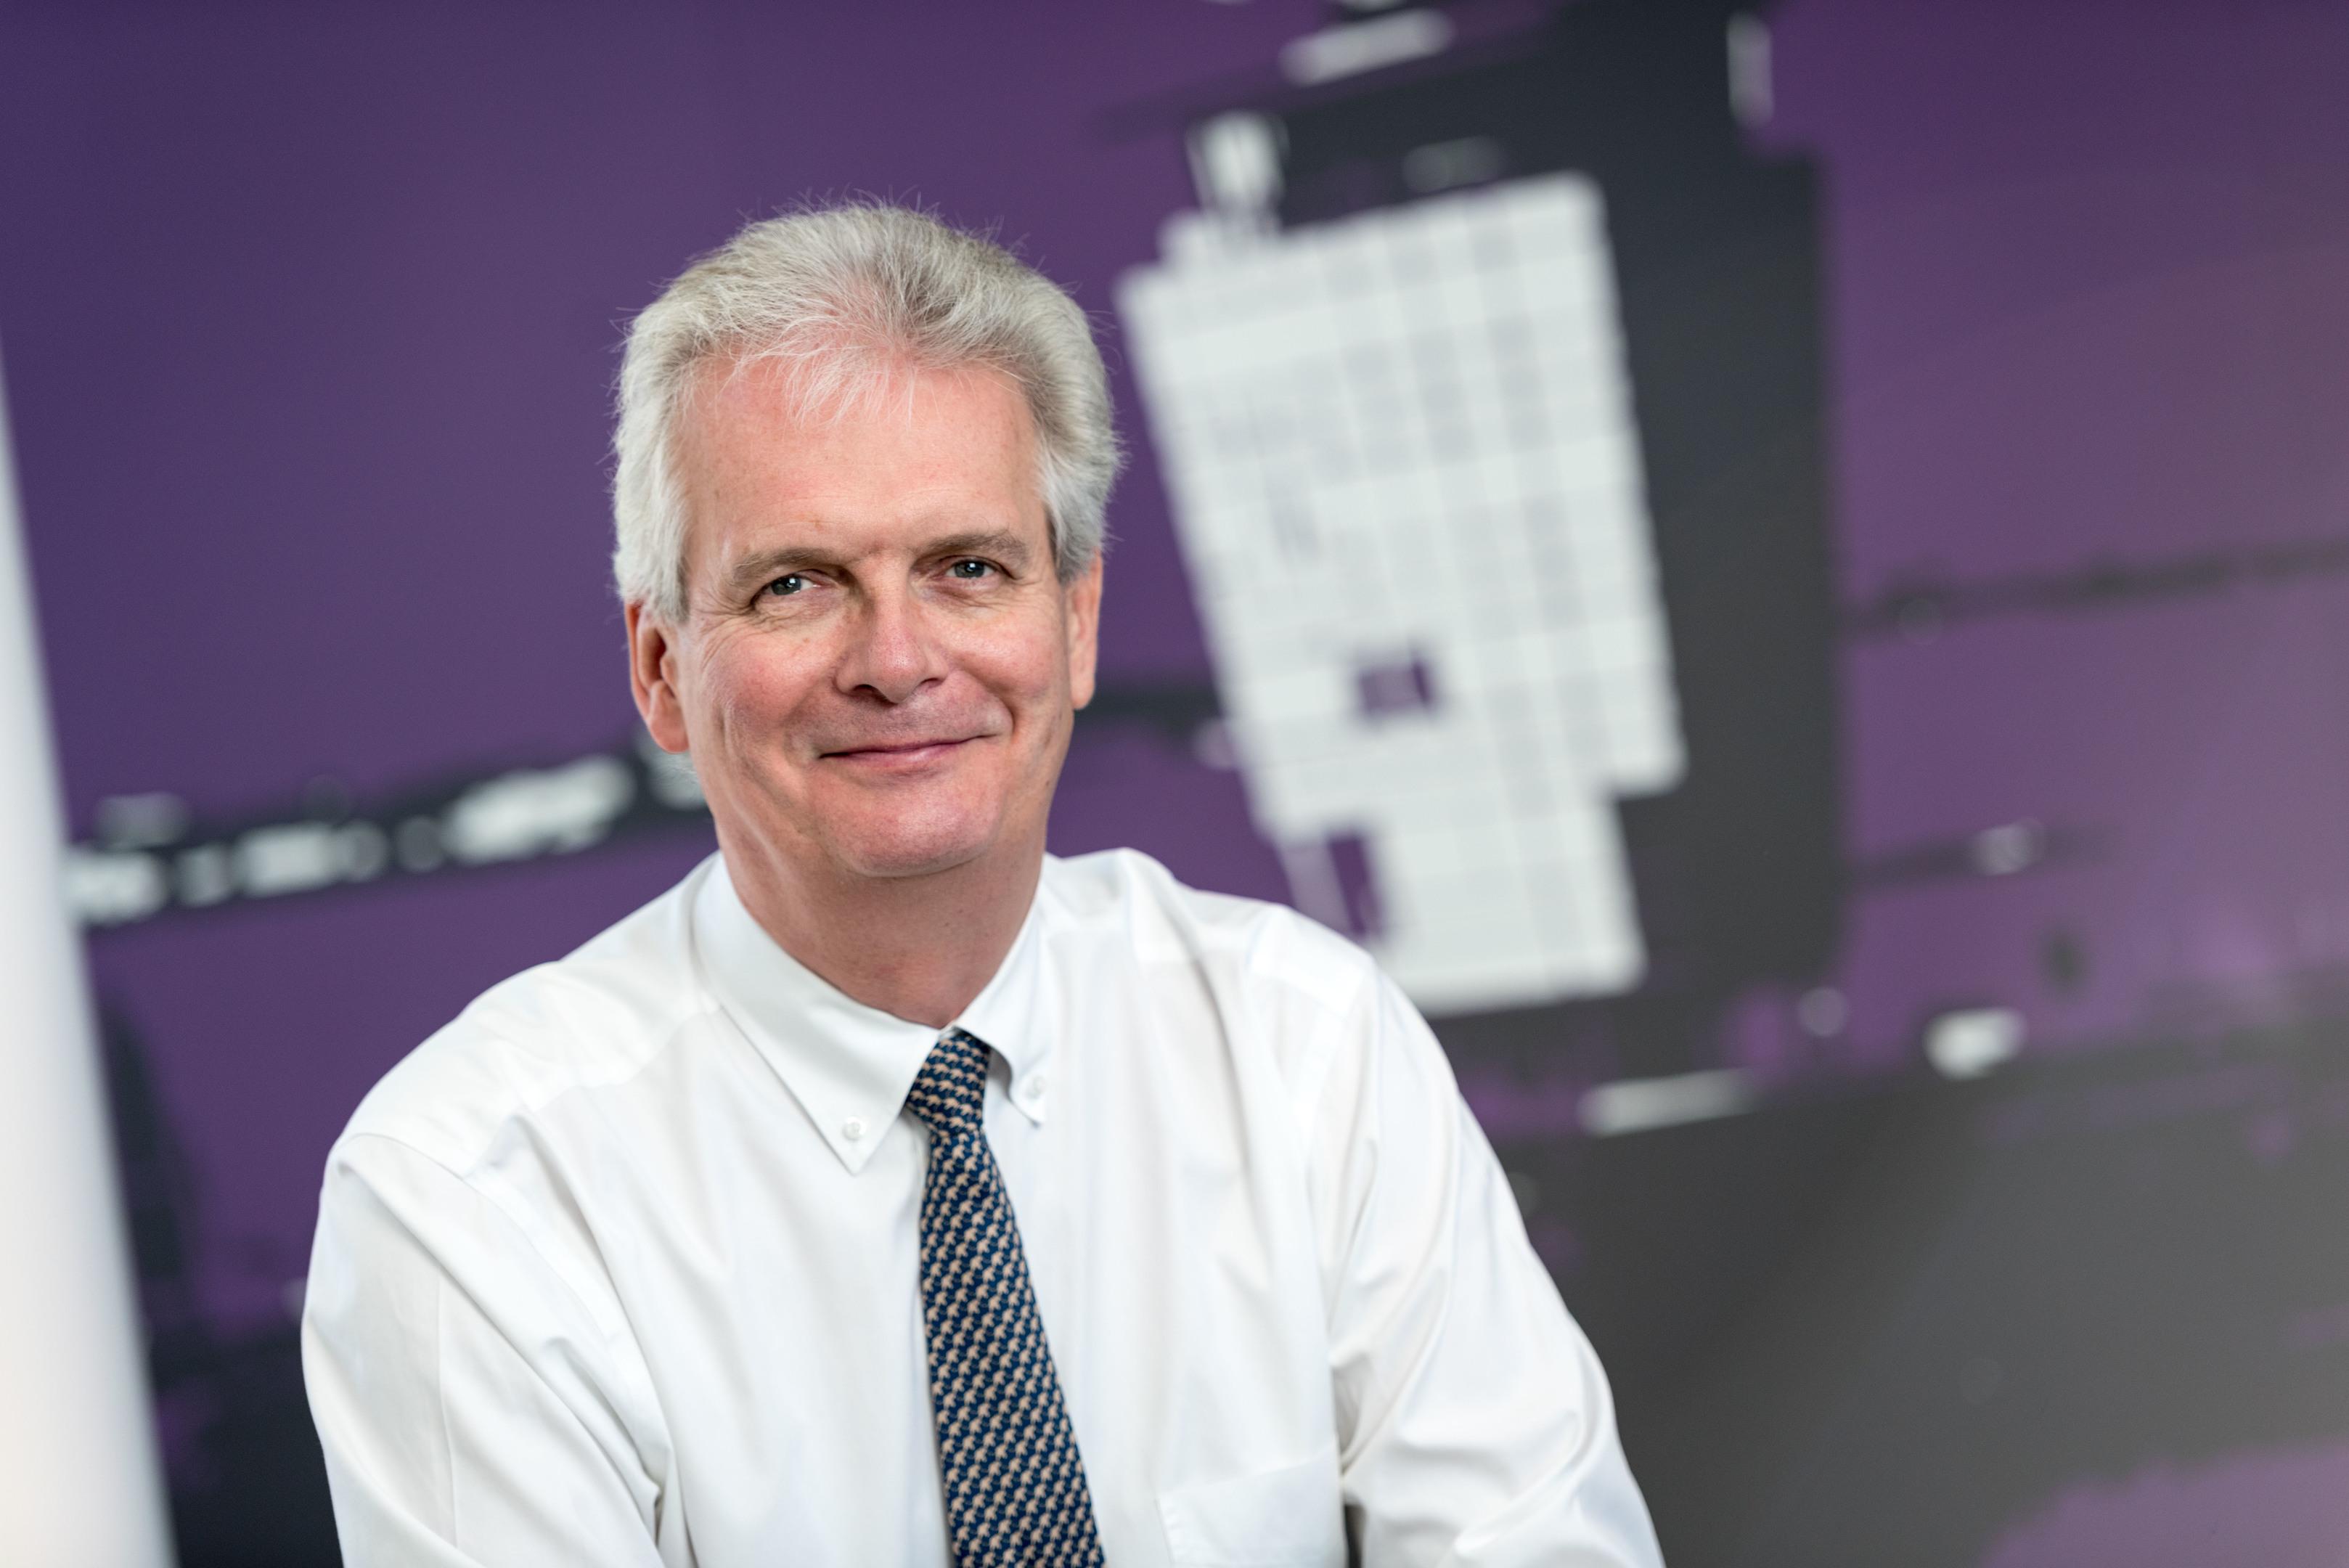 OGIC CEO Ian Phillips